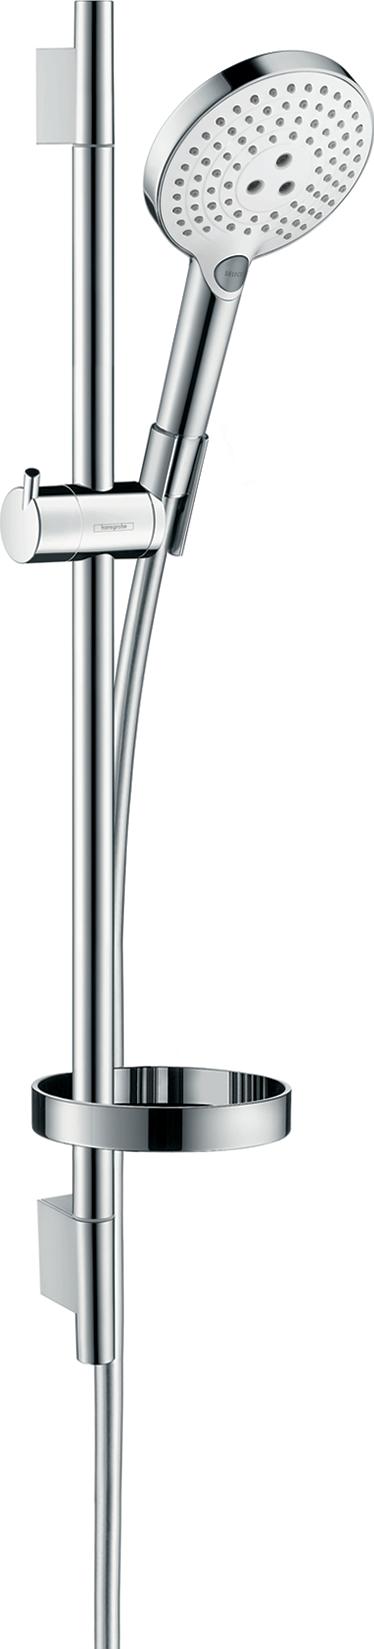 hansgrohe brausesets raindance select s brauseset 120 3jet mit brausestange 65 cm und. Black Bedroom Furniture Sets. Home Design Ideas